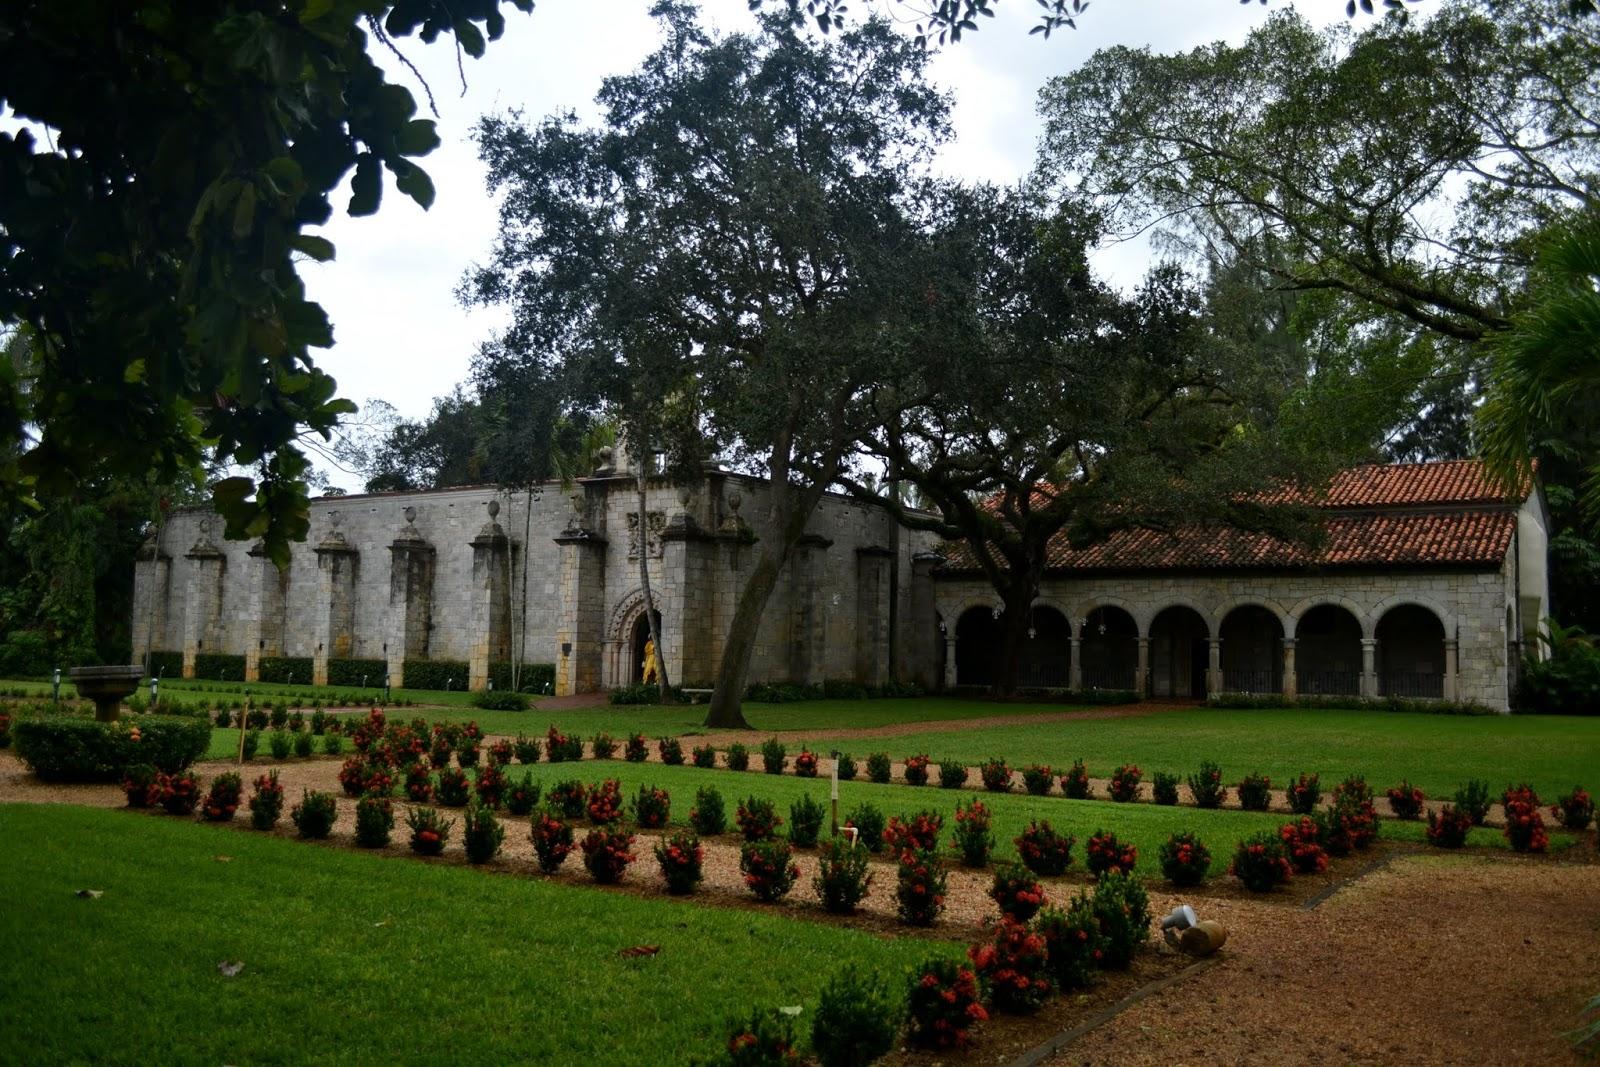 Самый старый испанский монастырь, Флорида (Ancient Spanish Monastery, FL)